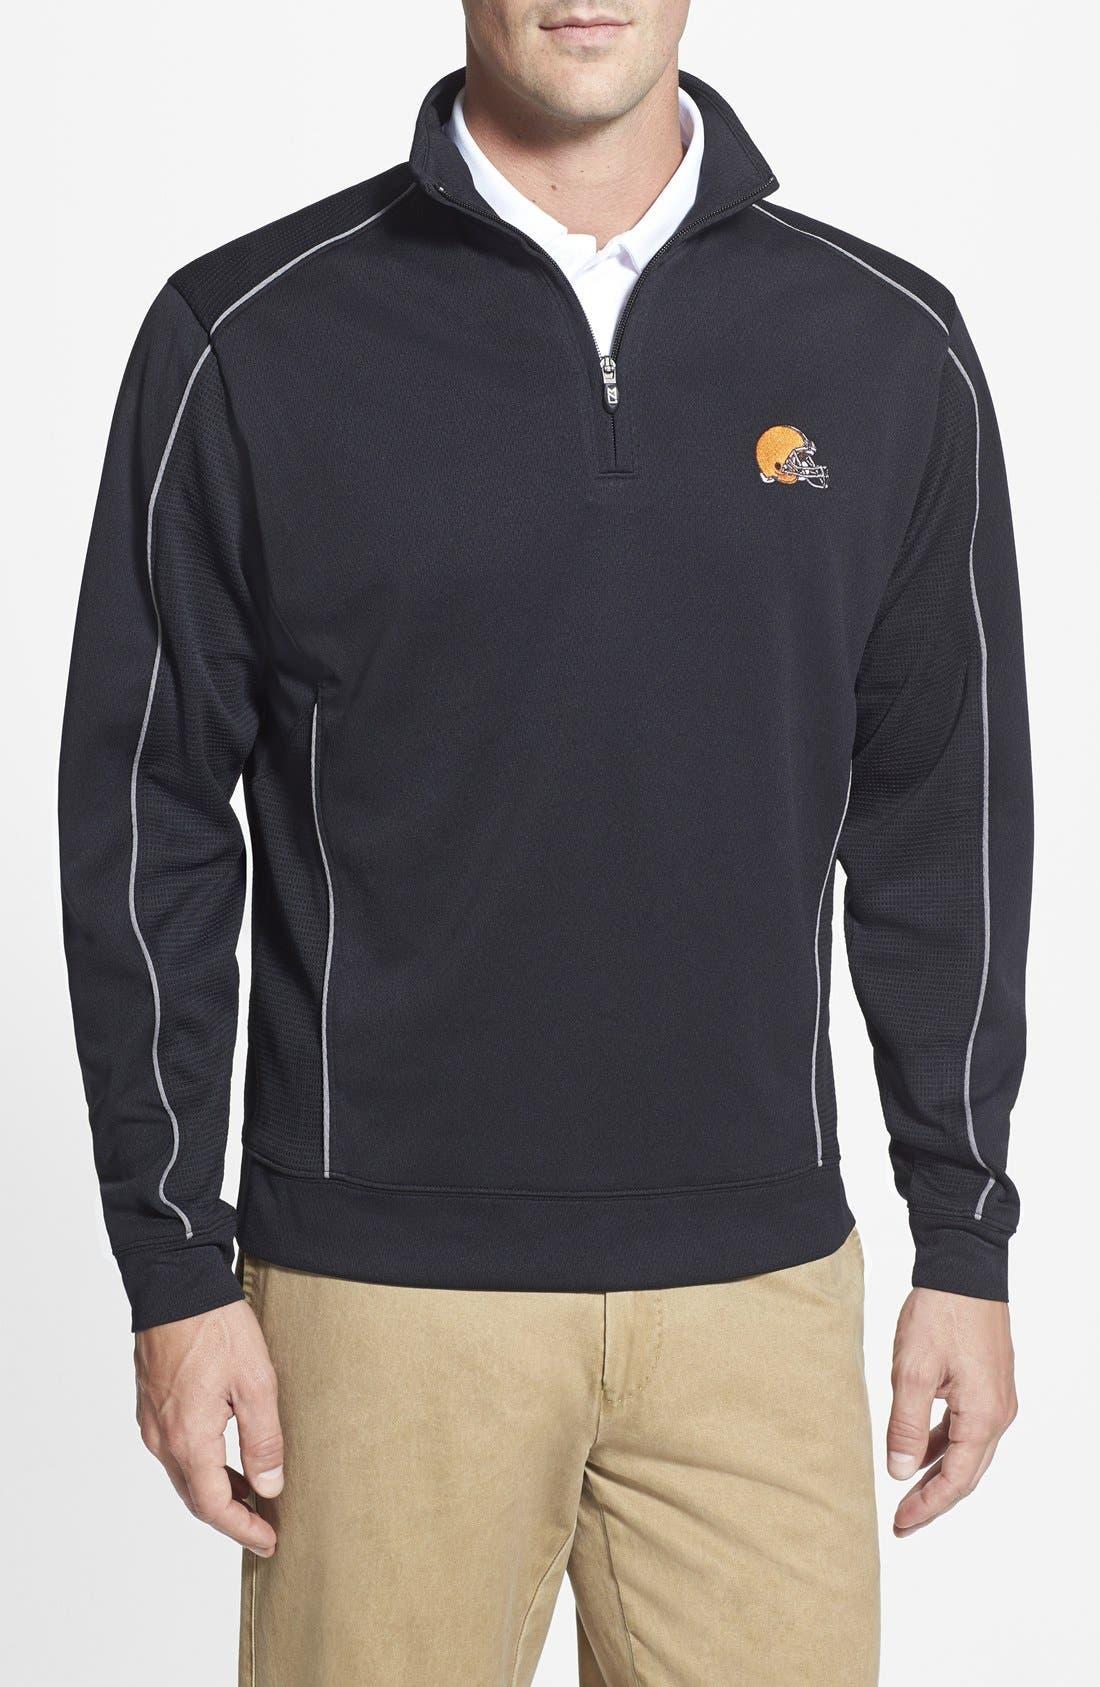 Cutter & Buck Cleveland Browns - Edge DryTec Moisture Wicking Half Zip Pullover